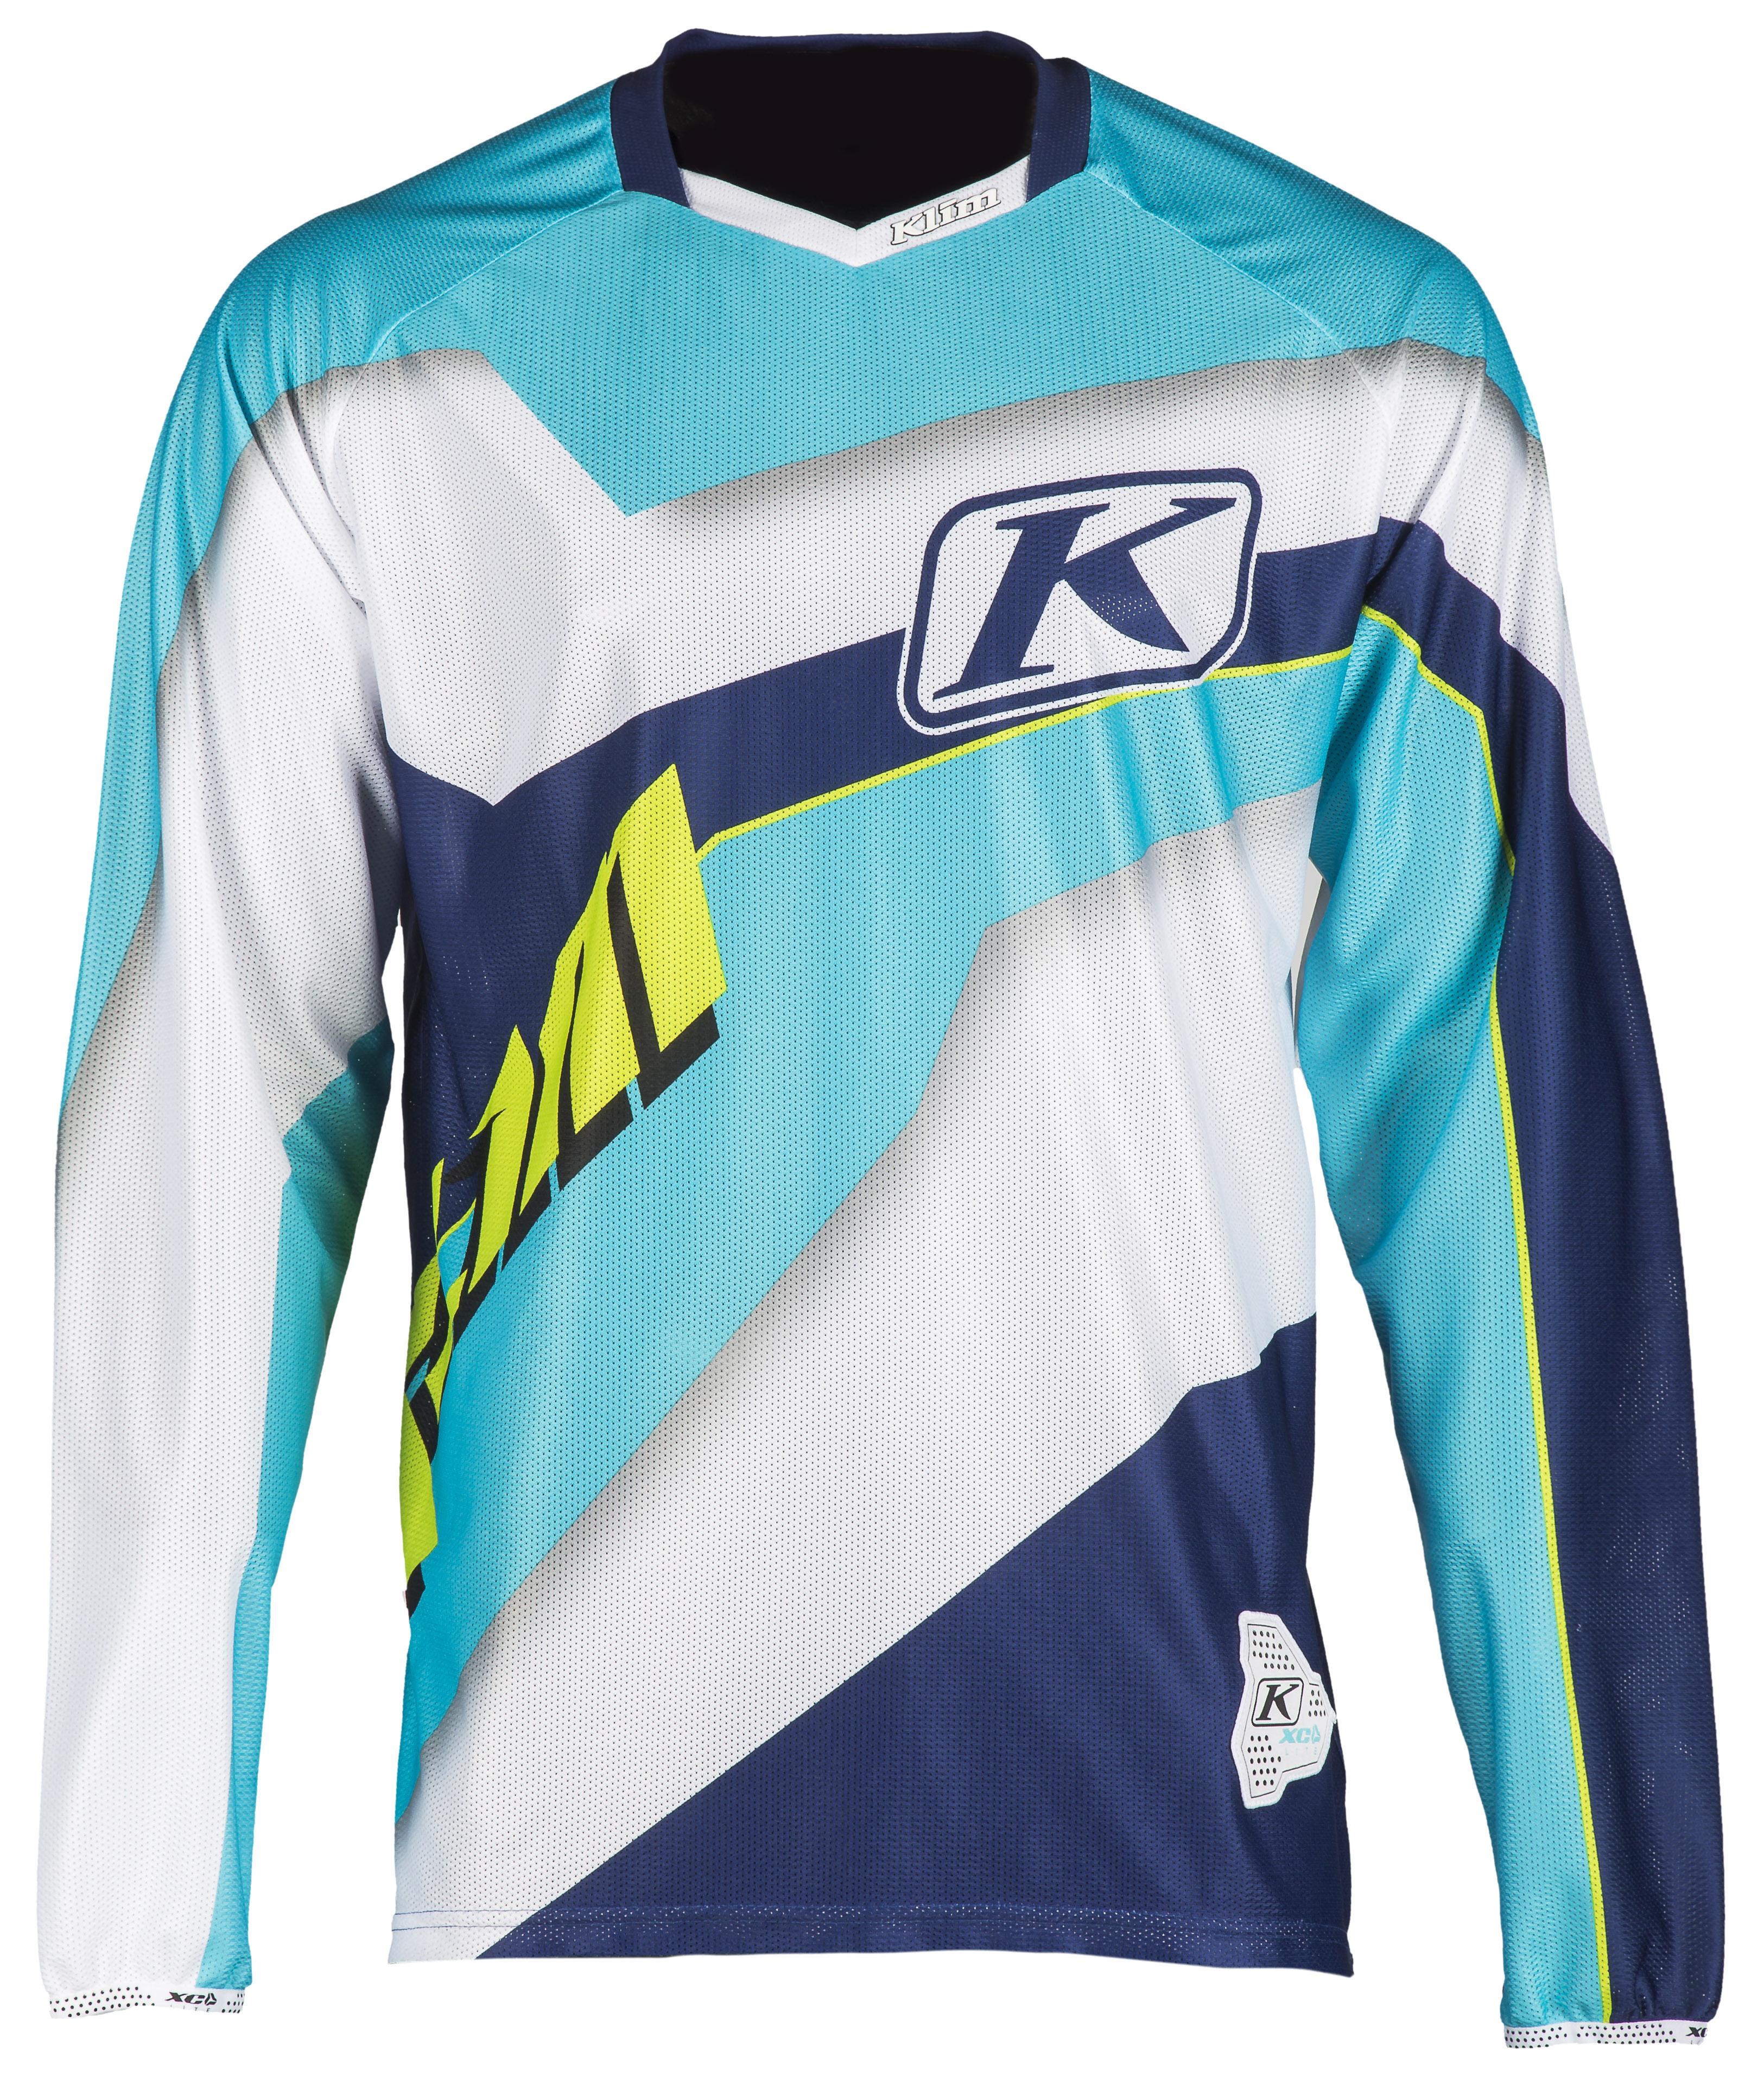 XC LITE Jersey 5003-002-200